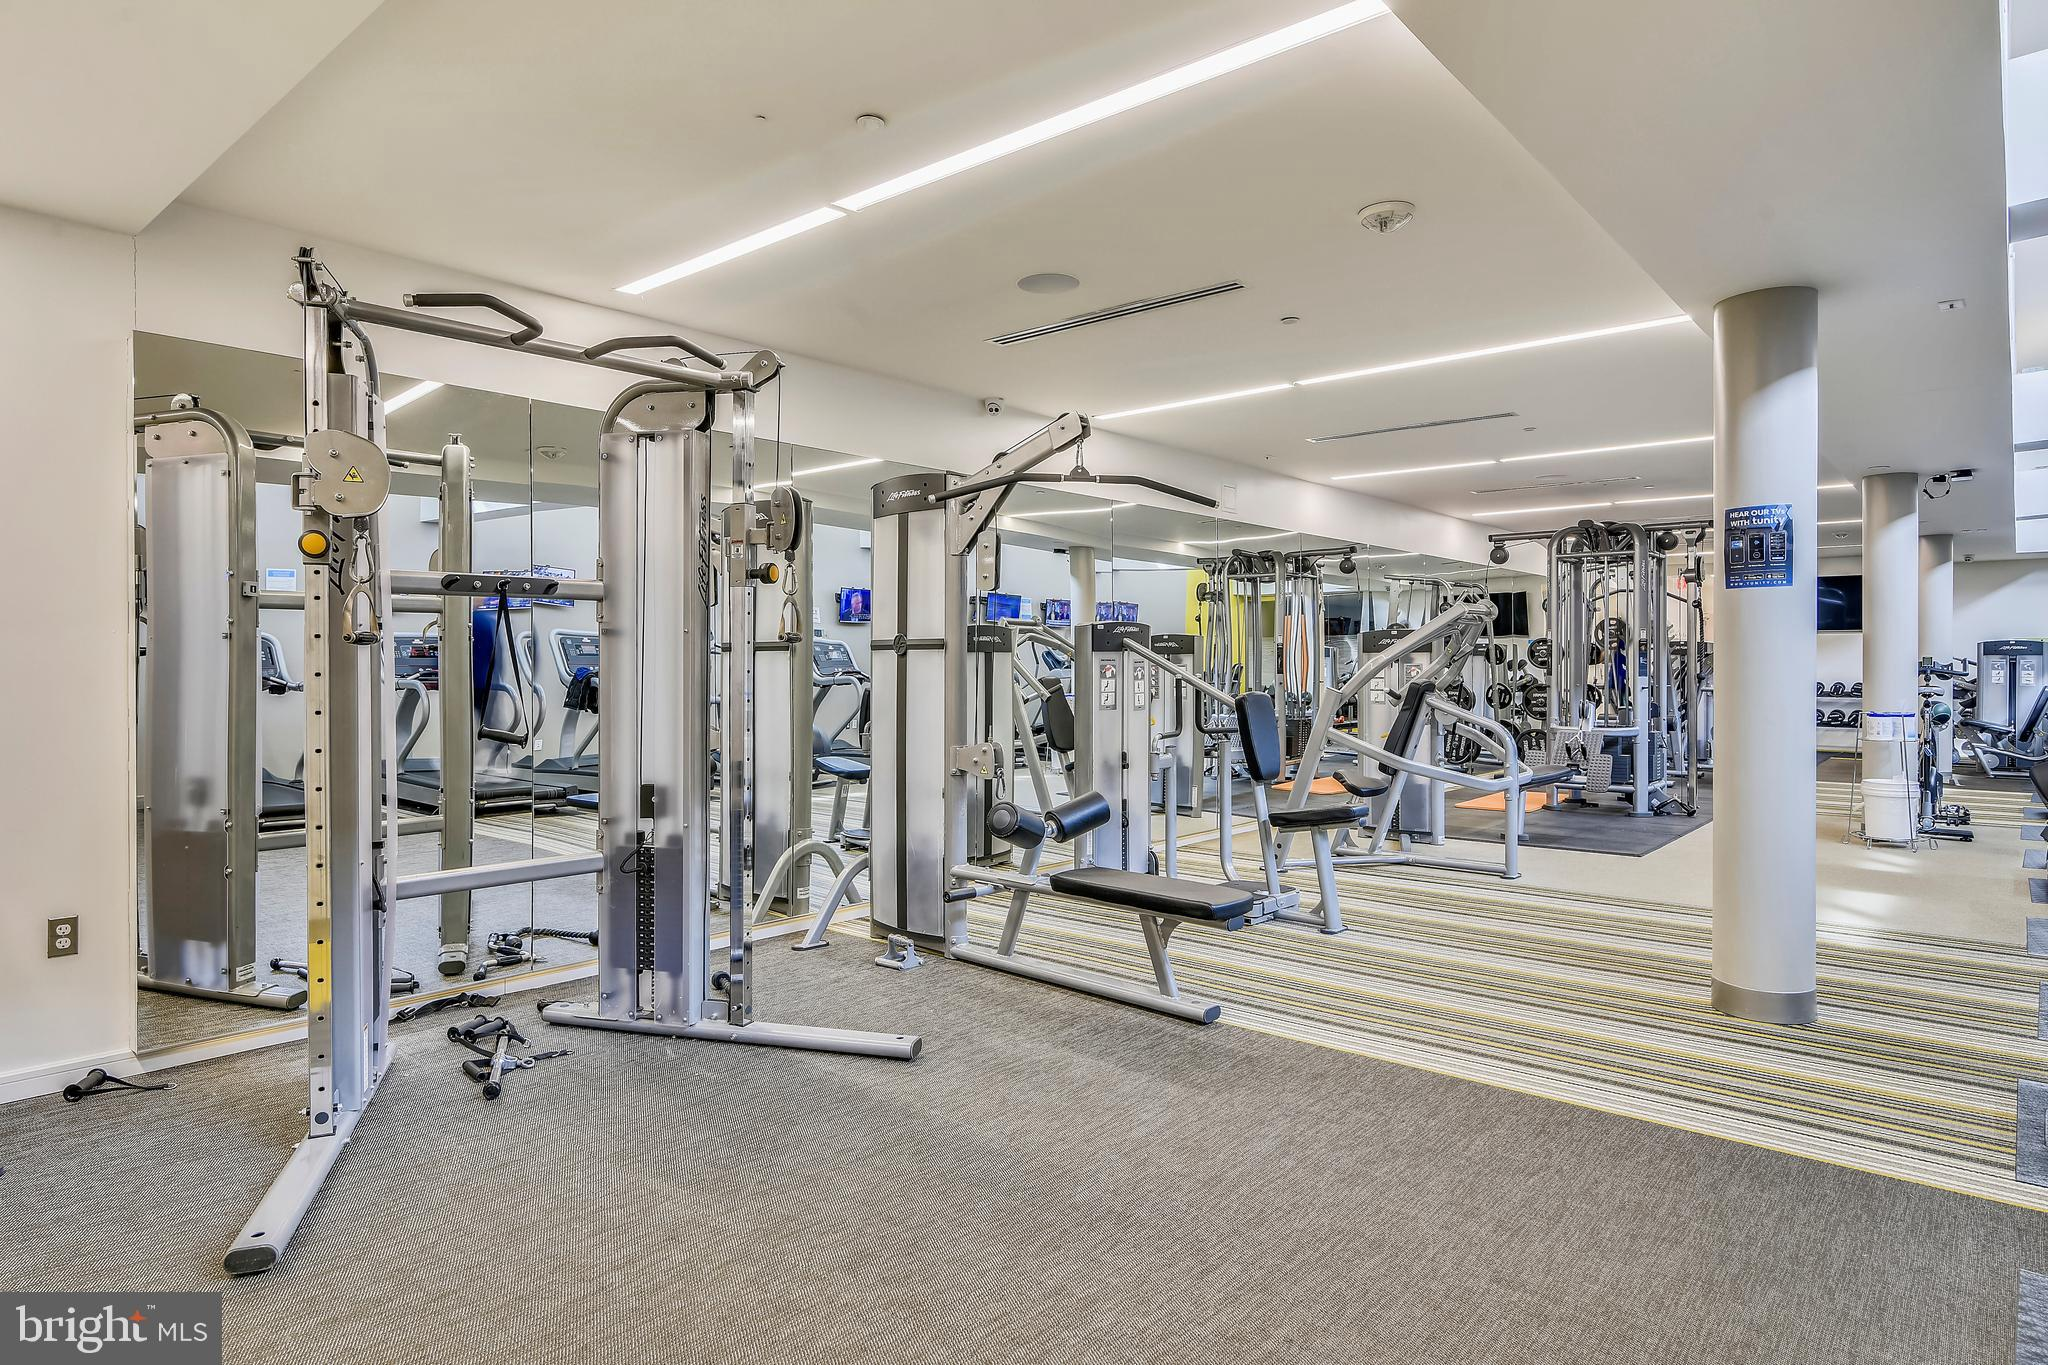 Gym review u aaron gerry